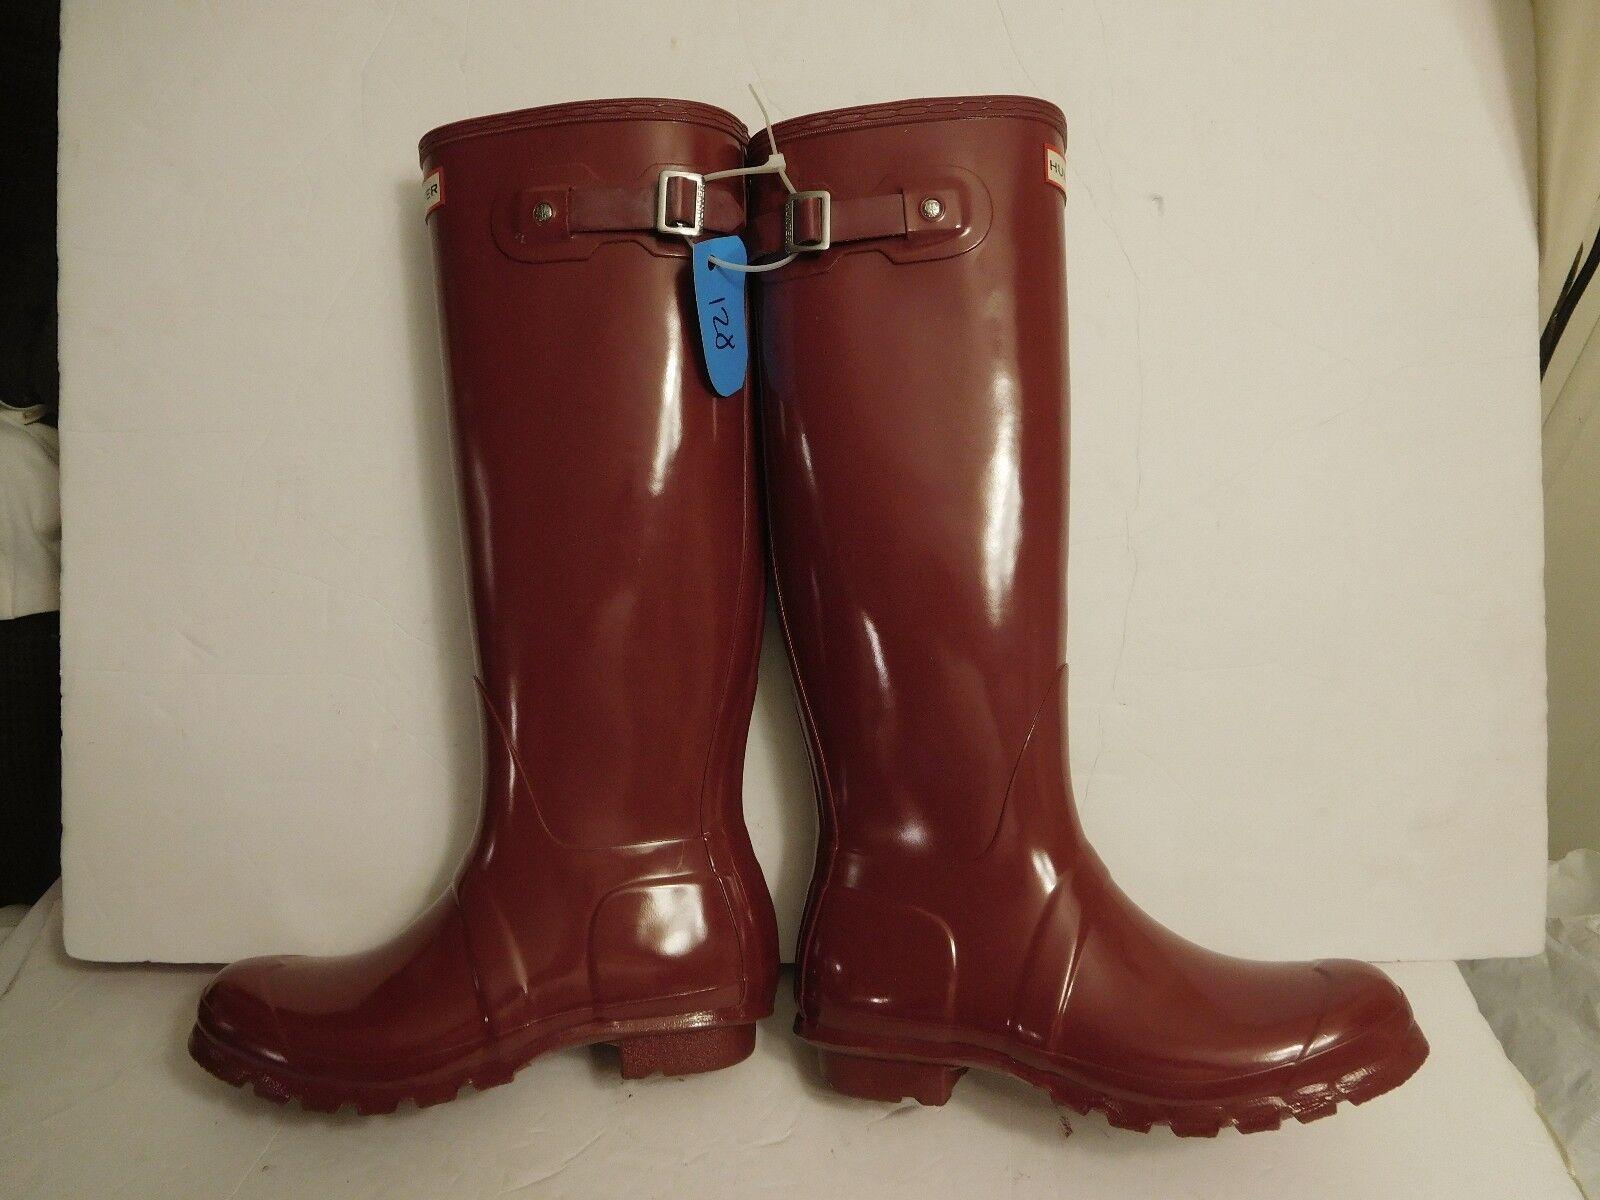 B-128 Hunter Original Tall' ' para botas Lluvia botas para Marrón Brillante (mujeres) Talla 8  150.00 2a23fe